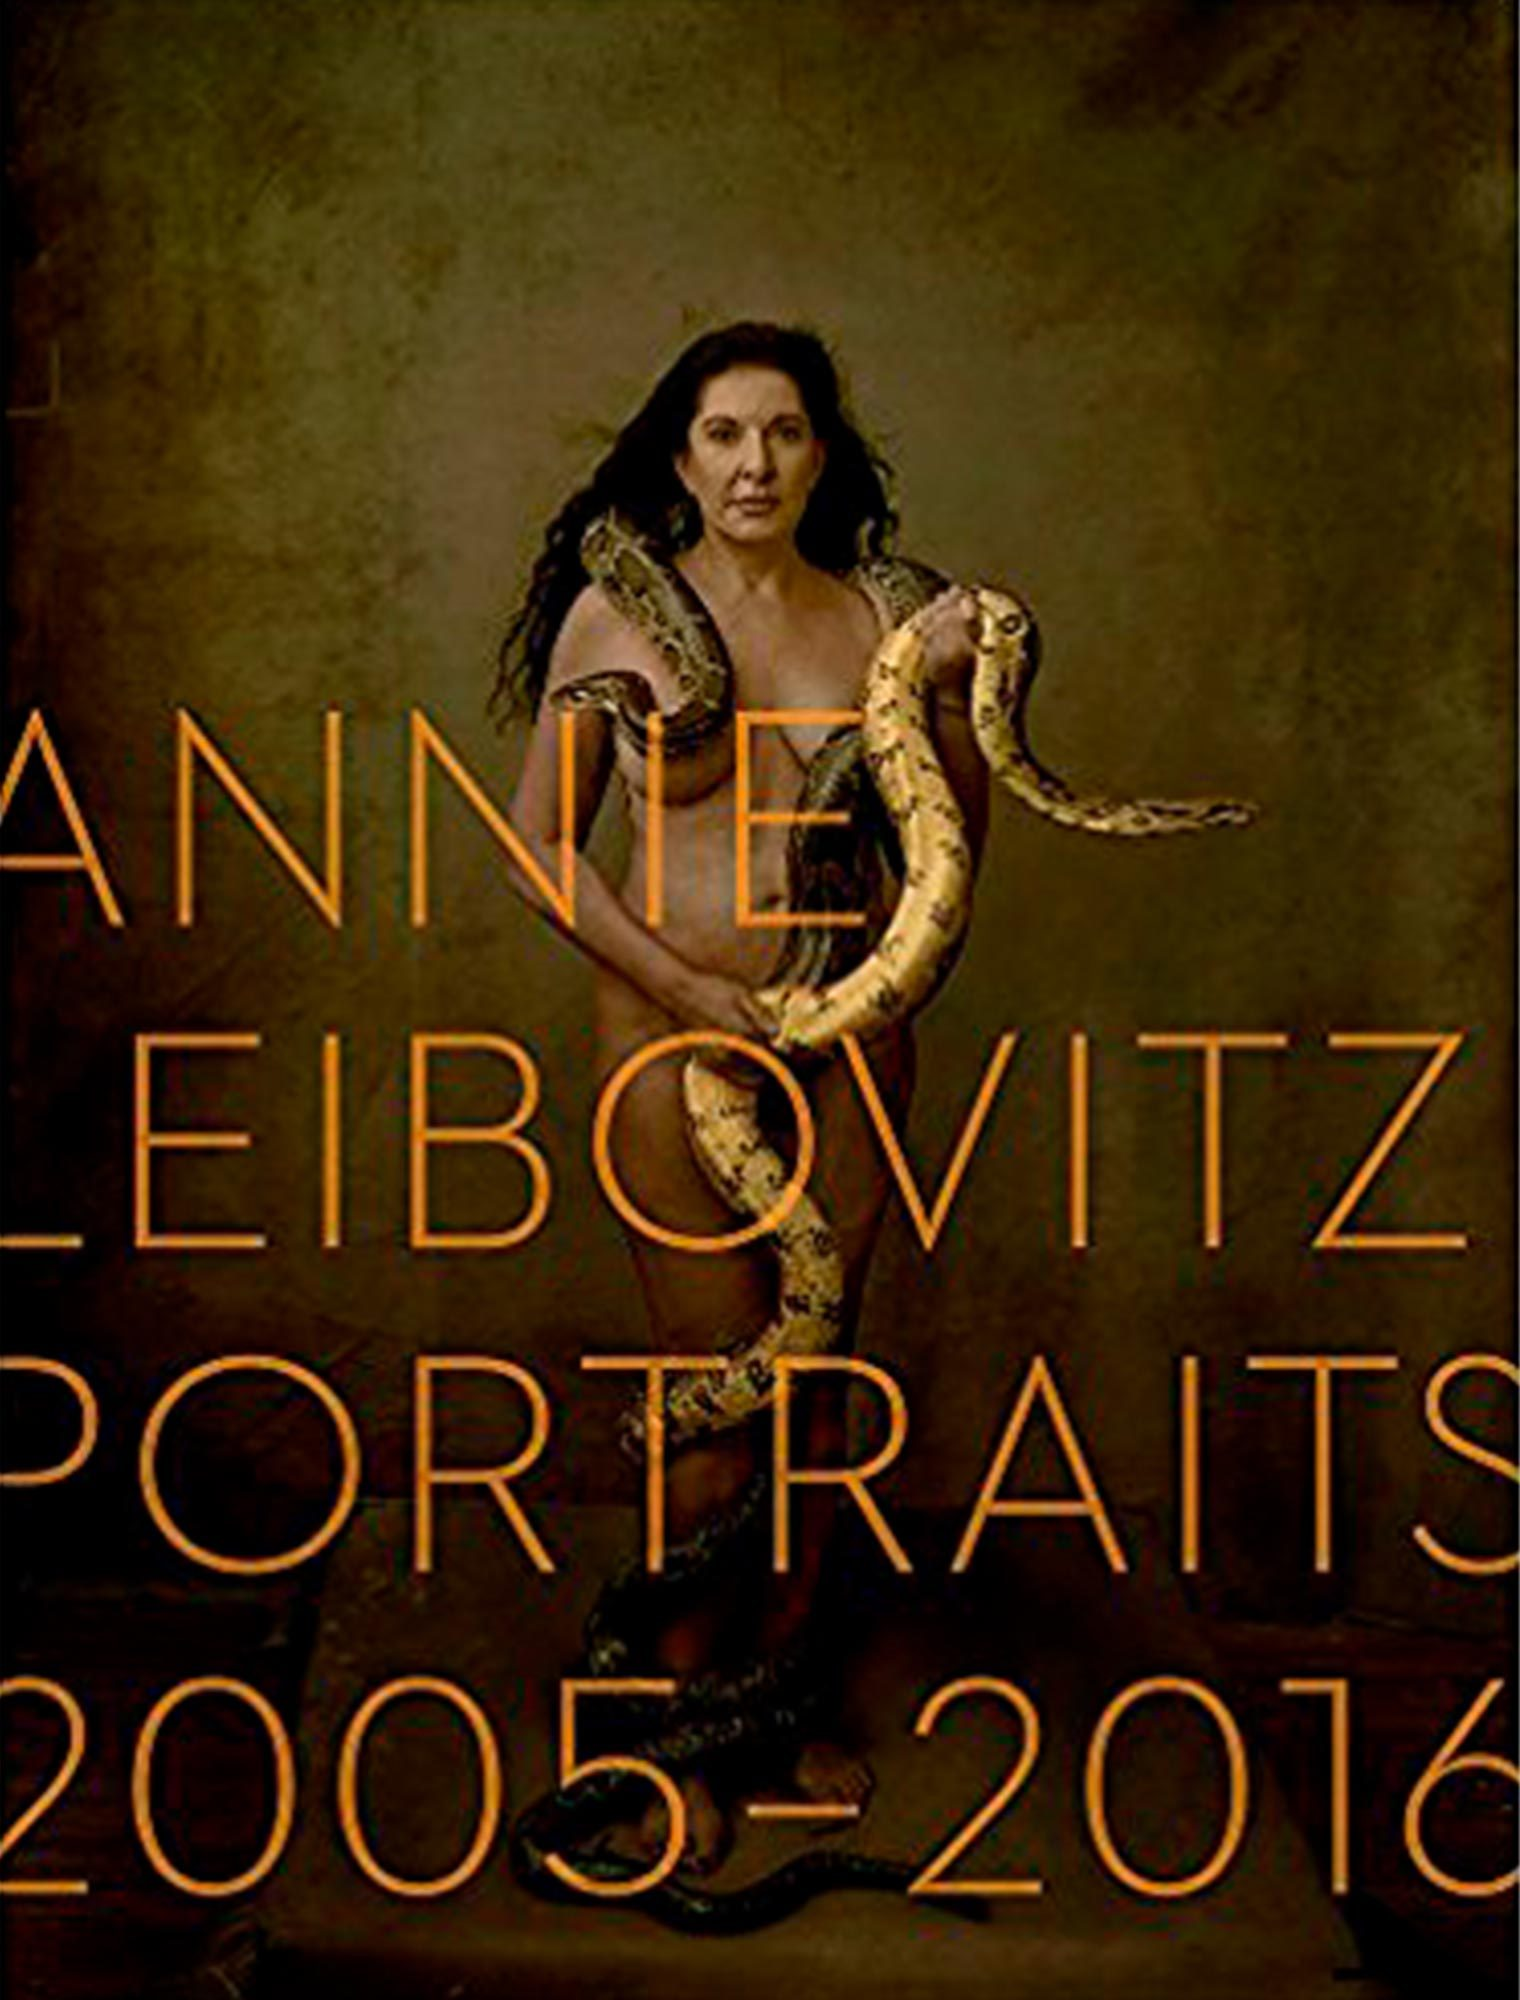 Annie Leibovits